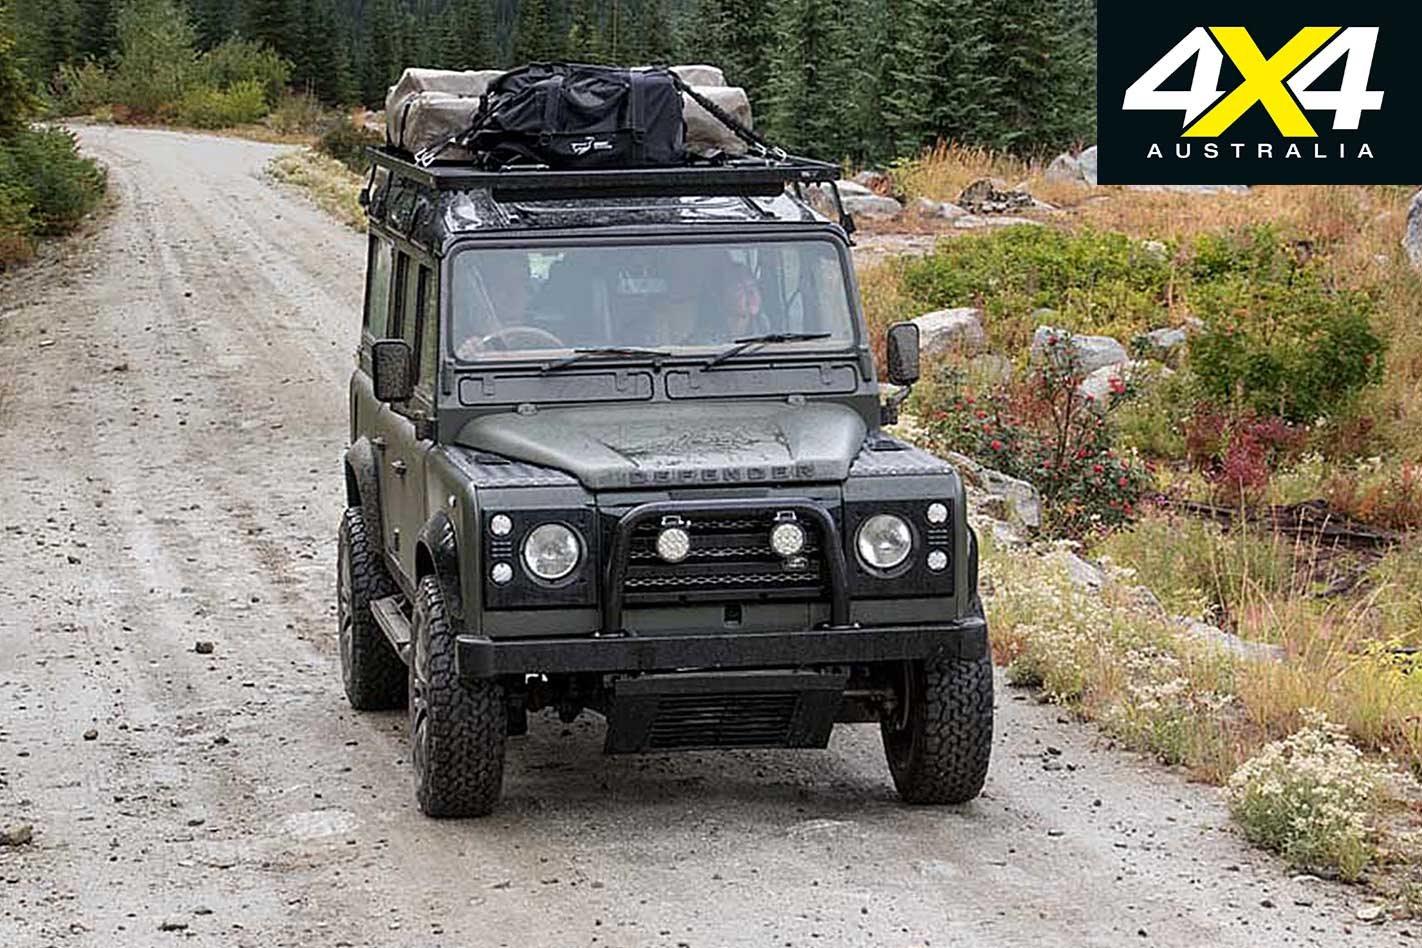 Custom Cummins-powered 1988 Land Rover Defender 110 review